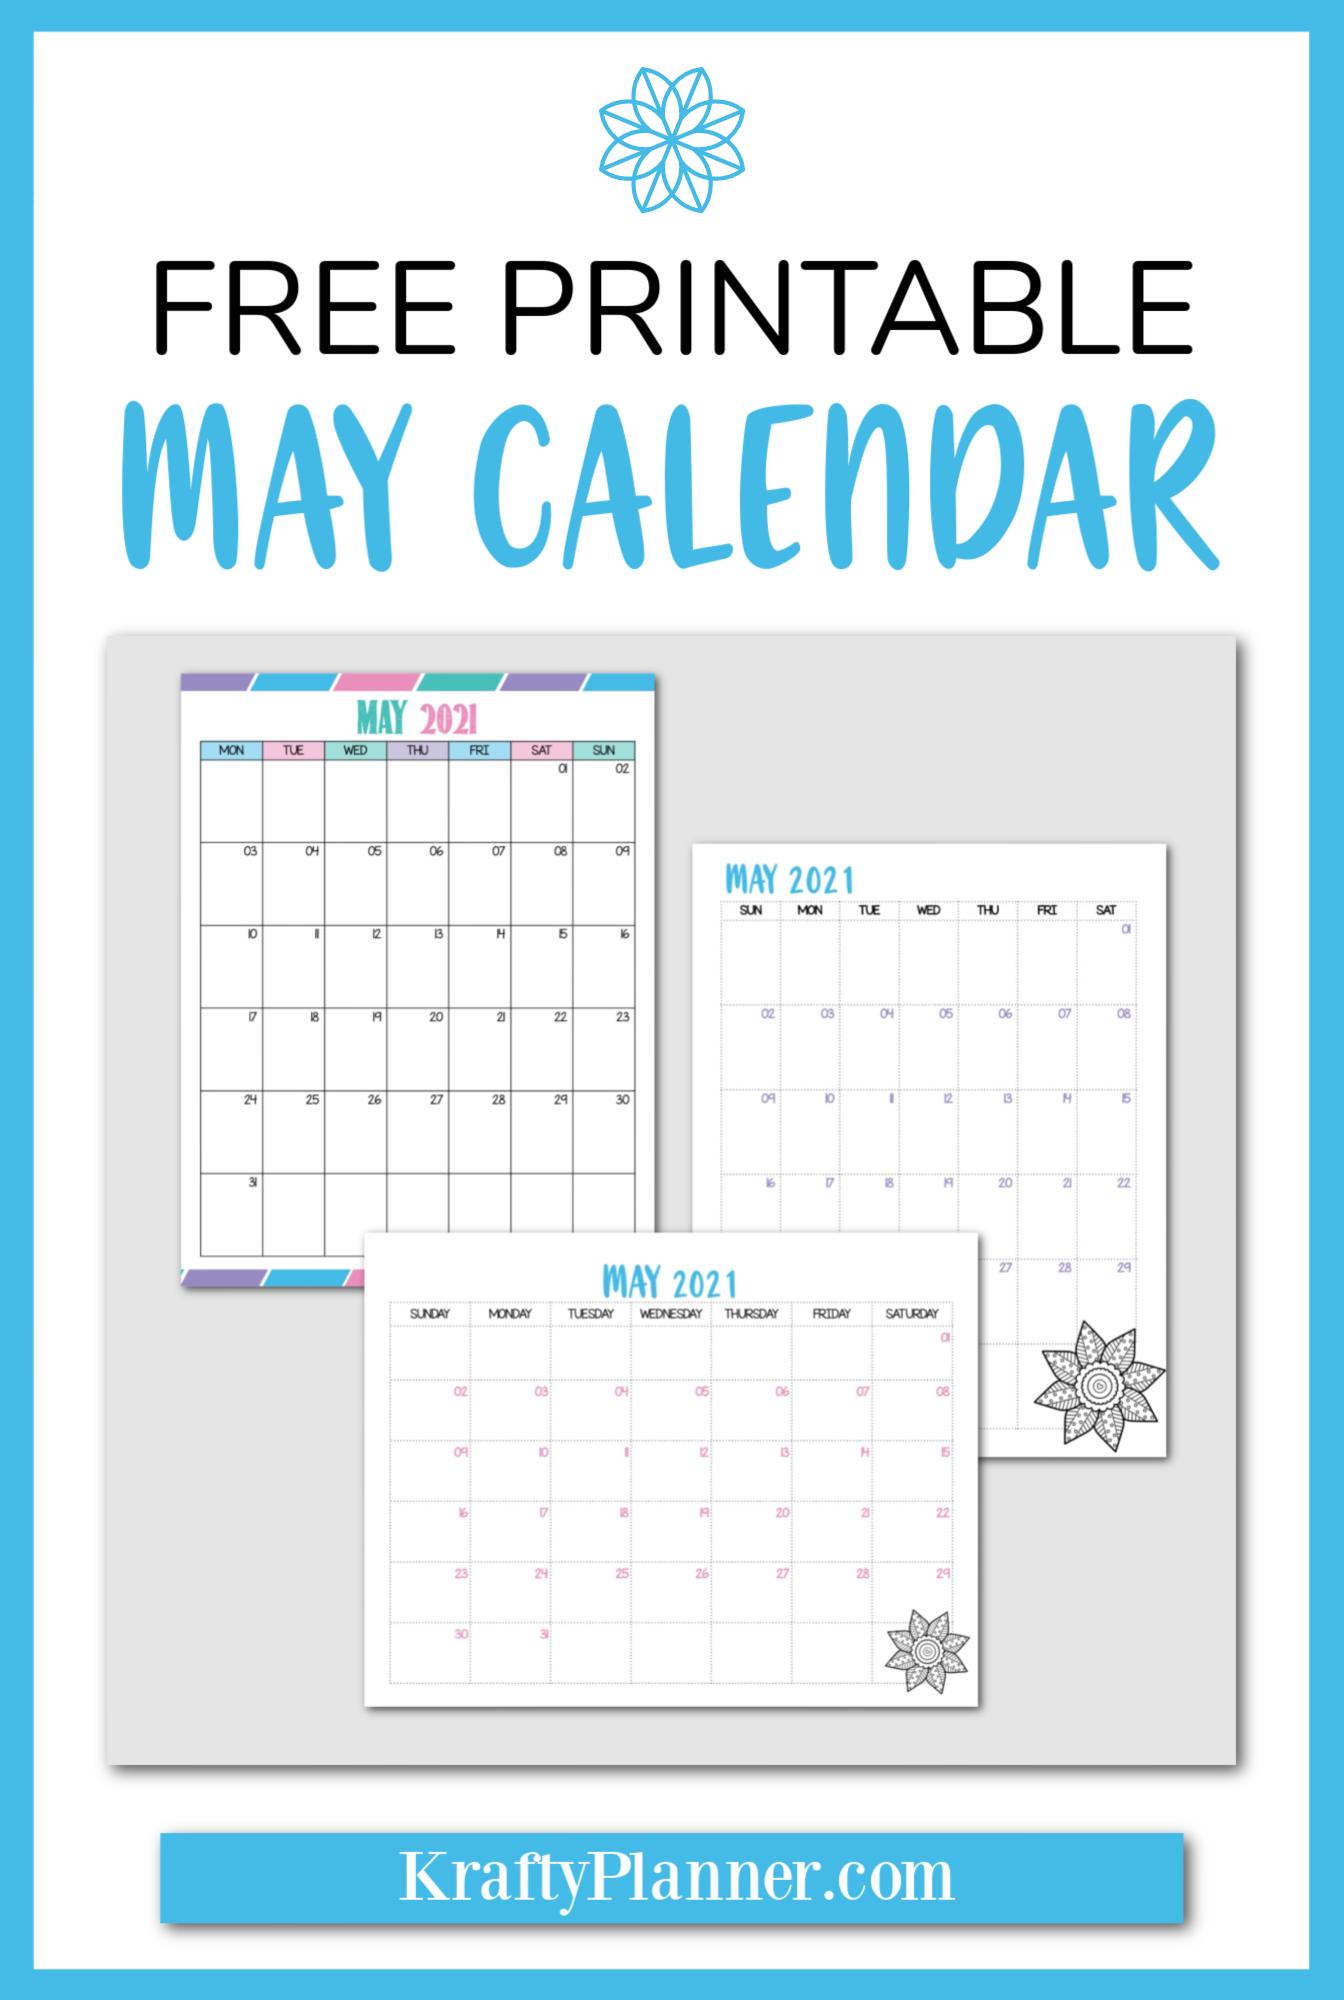 Free Printable May Calendar PIN 2 copy.png